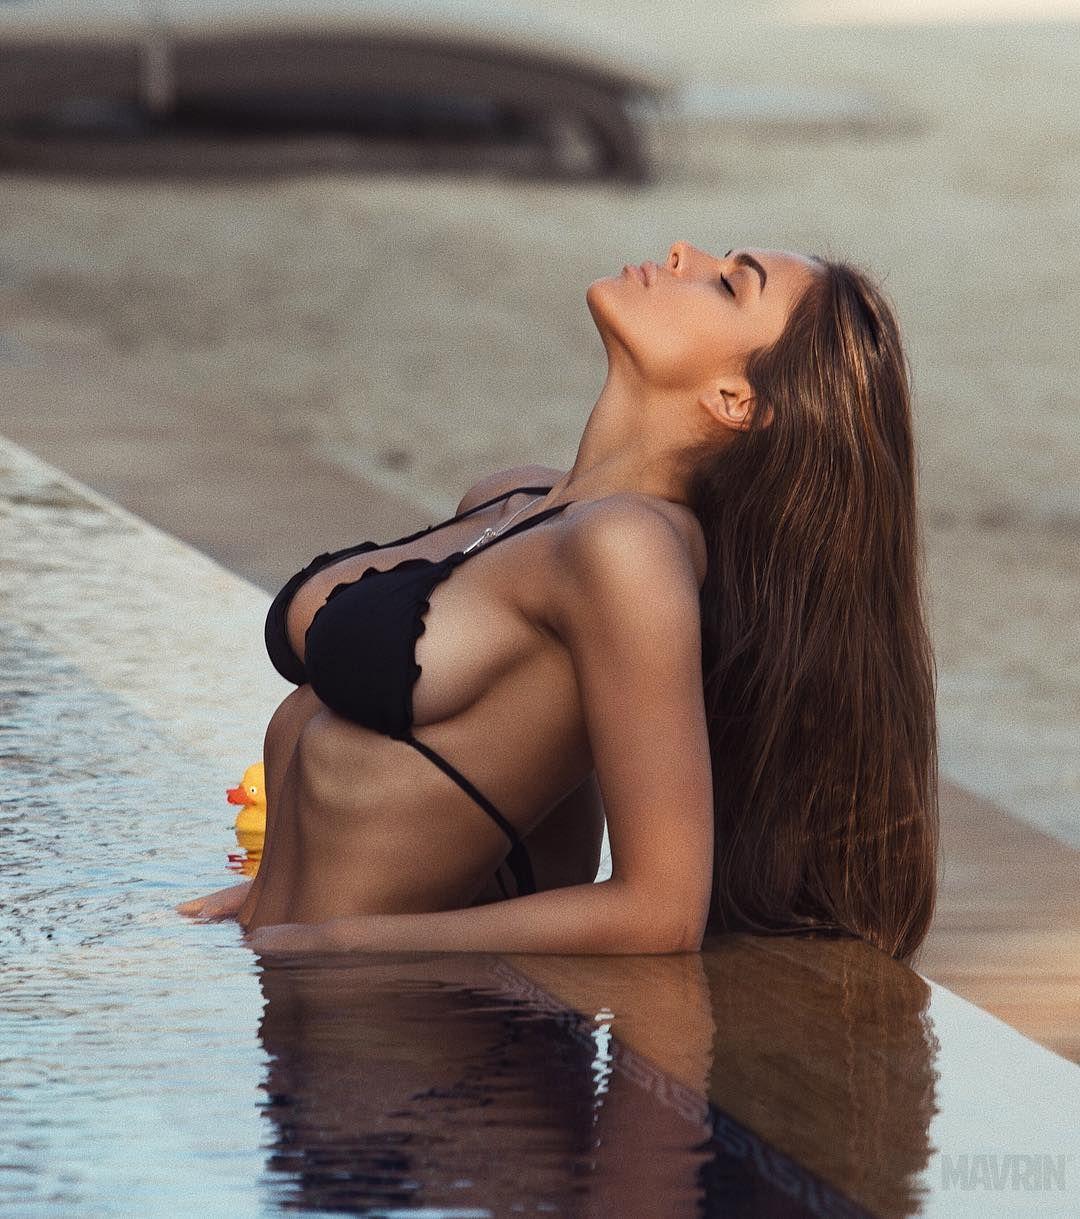 Instagram Viki Odintcova nude (53 foto and video), Sexy, Bikini, Boobs, legs 2015